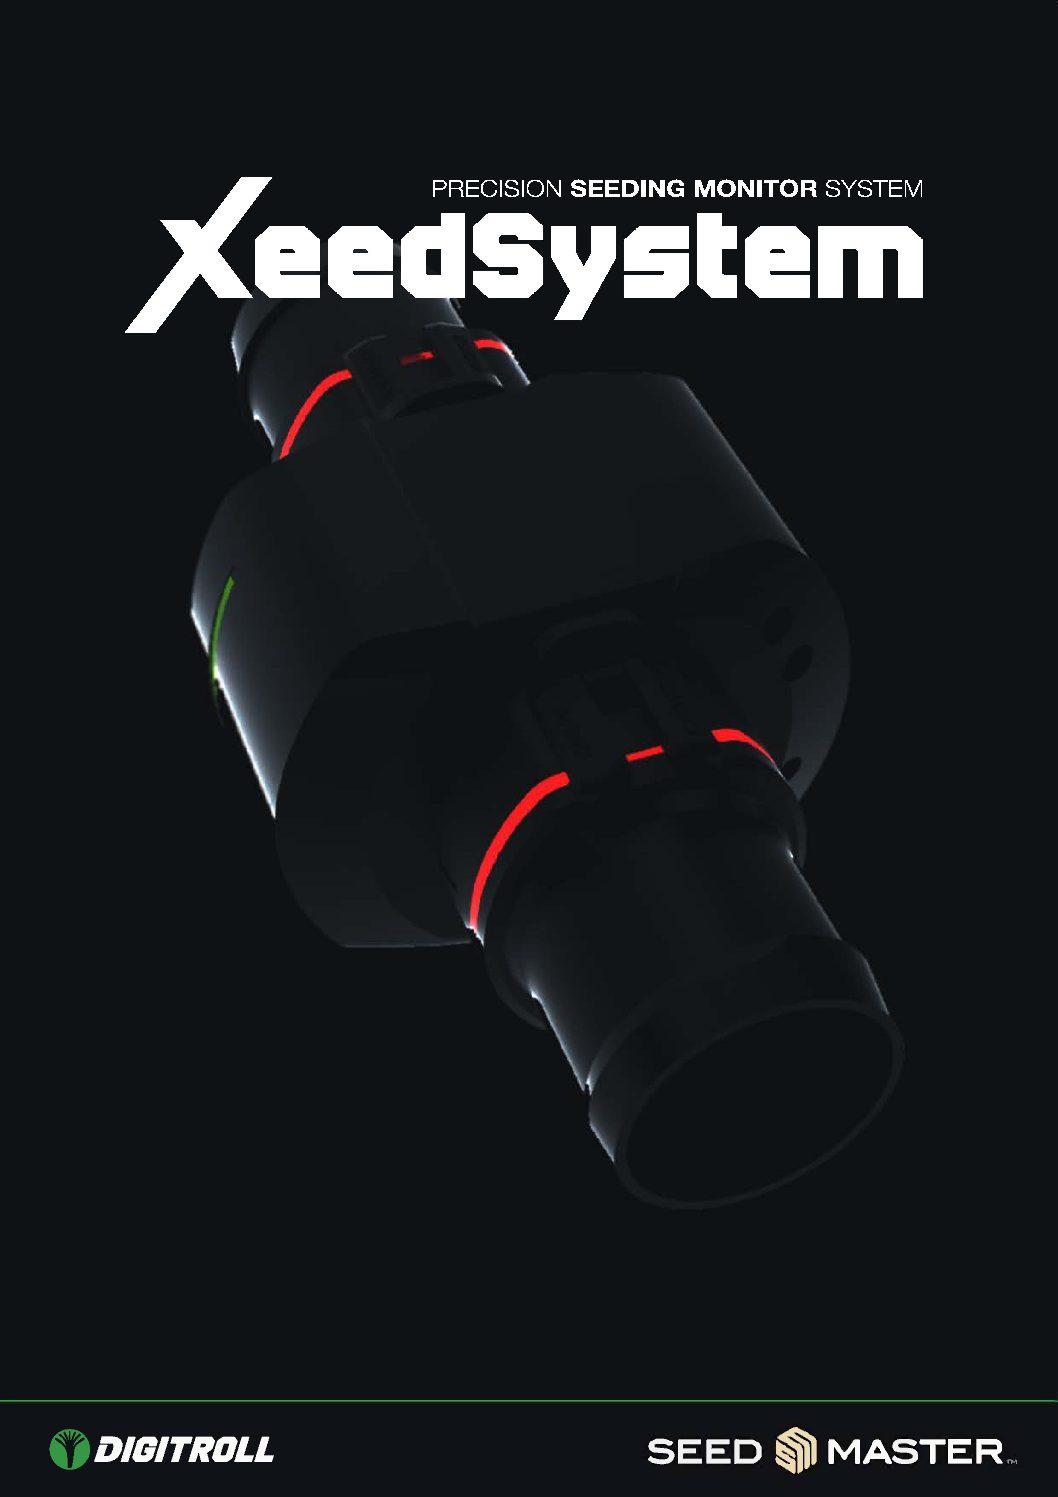 XeedSystem